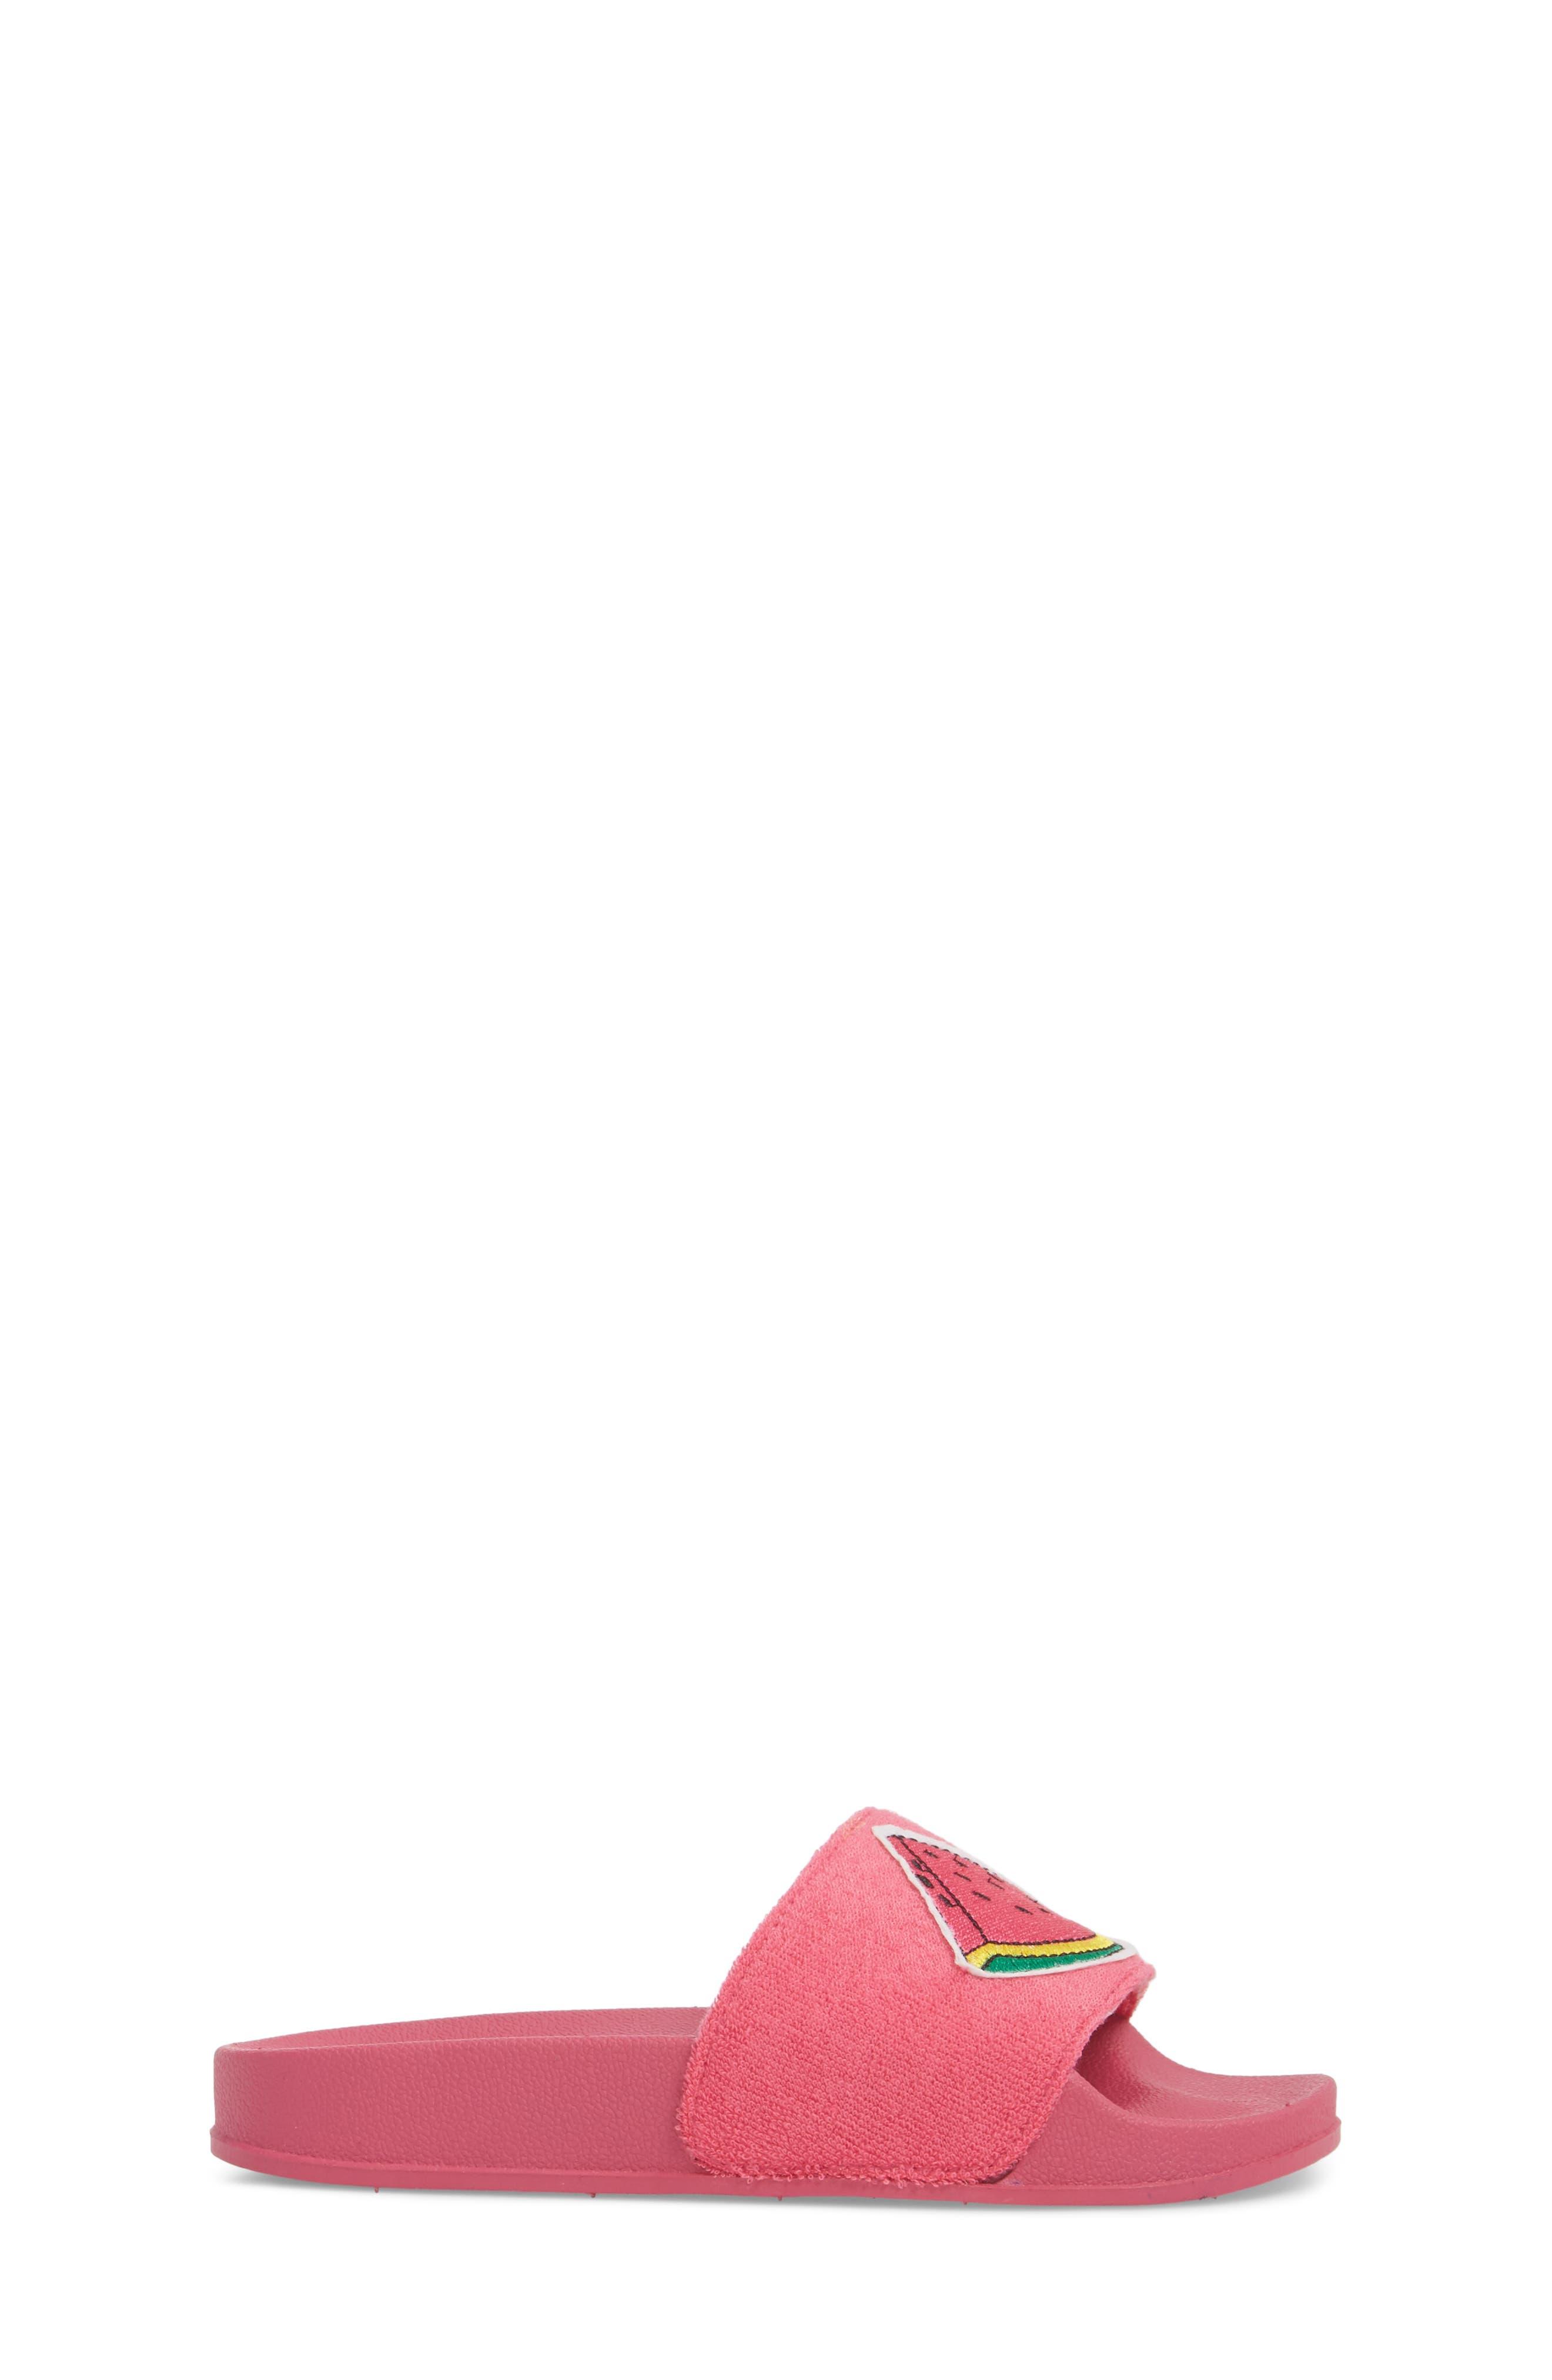 Selby Fruit Embroidered Sport Slide,                             Alternate thumbnail 3, color,                             Fuchsia